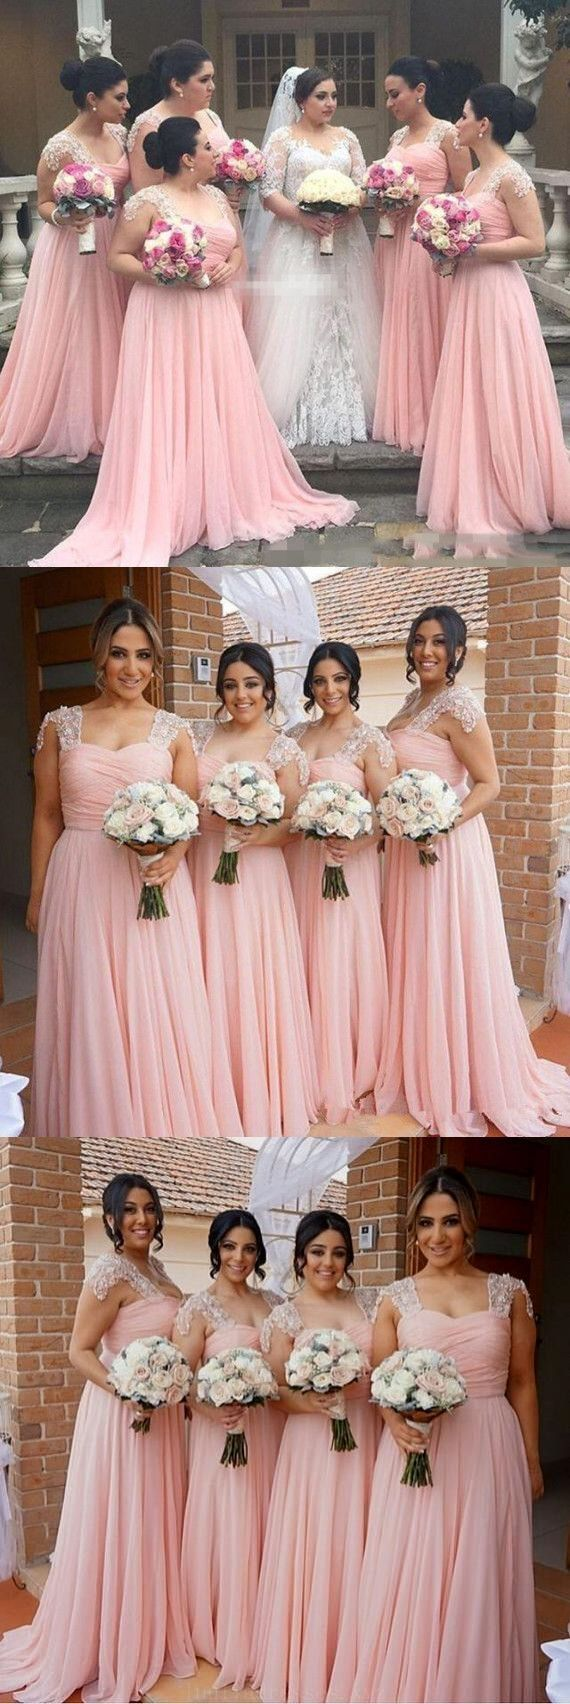 Outlet easy long bridesmaid dresses elegant aline pink long chiffon